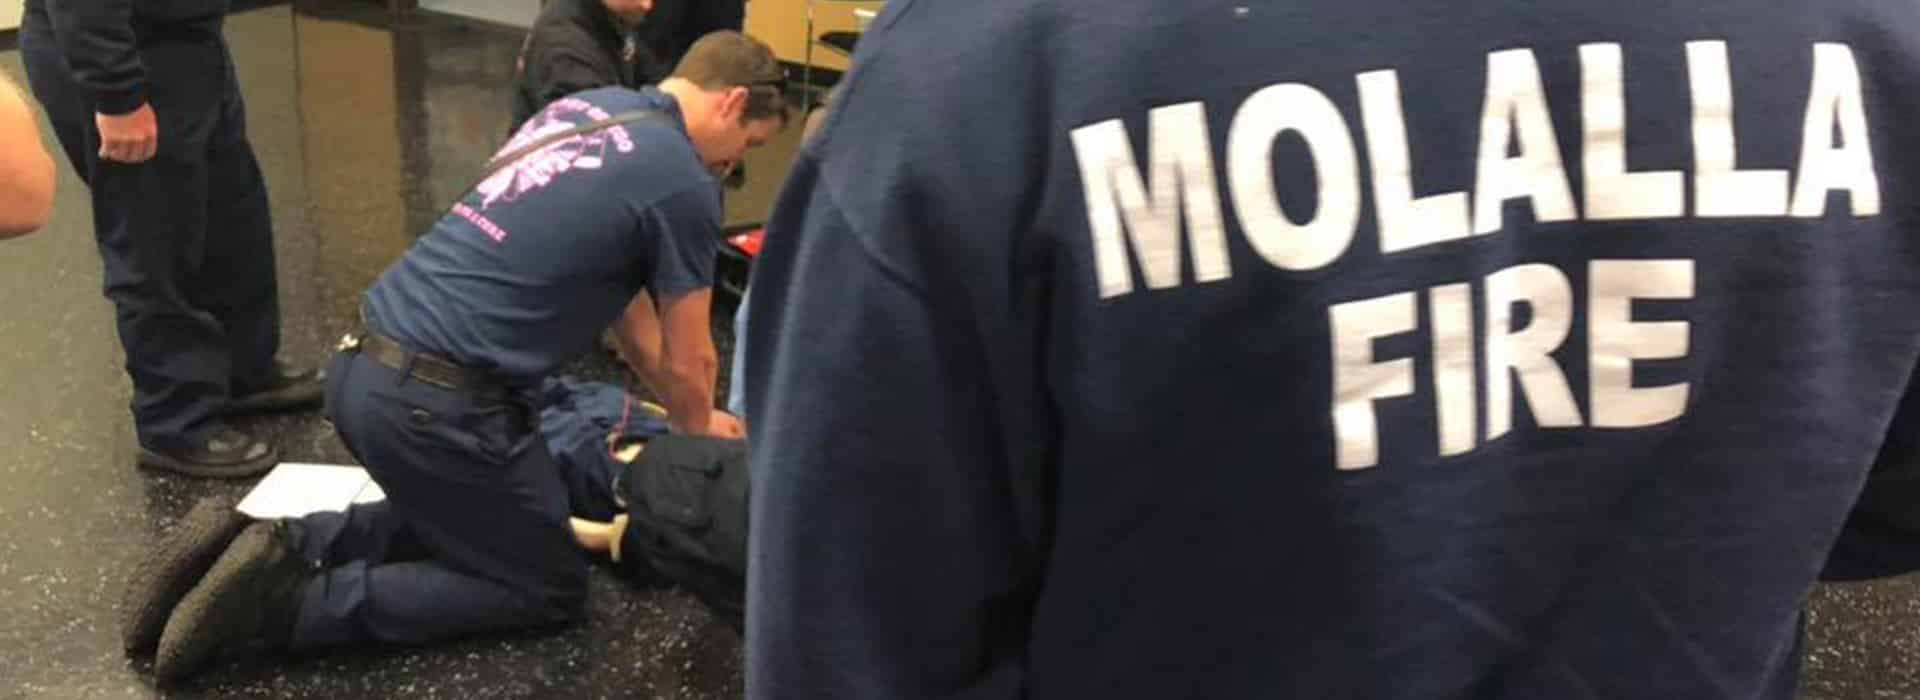 Molalla Fire EMS volunteers practice CPR skills